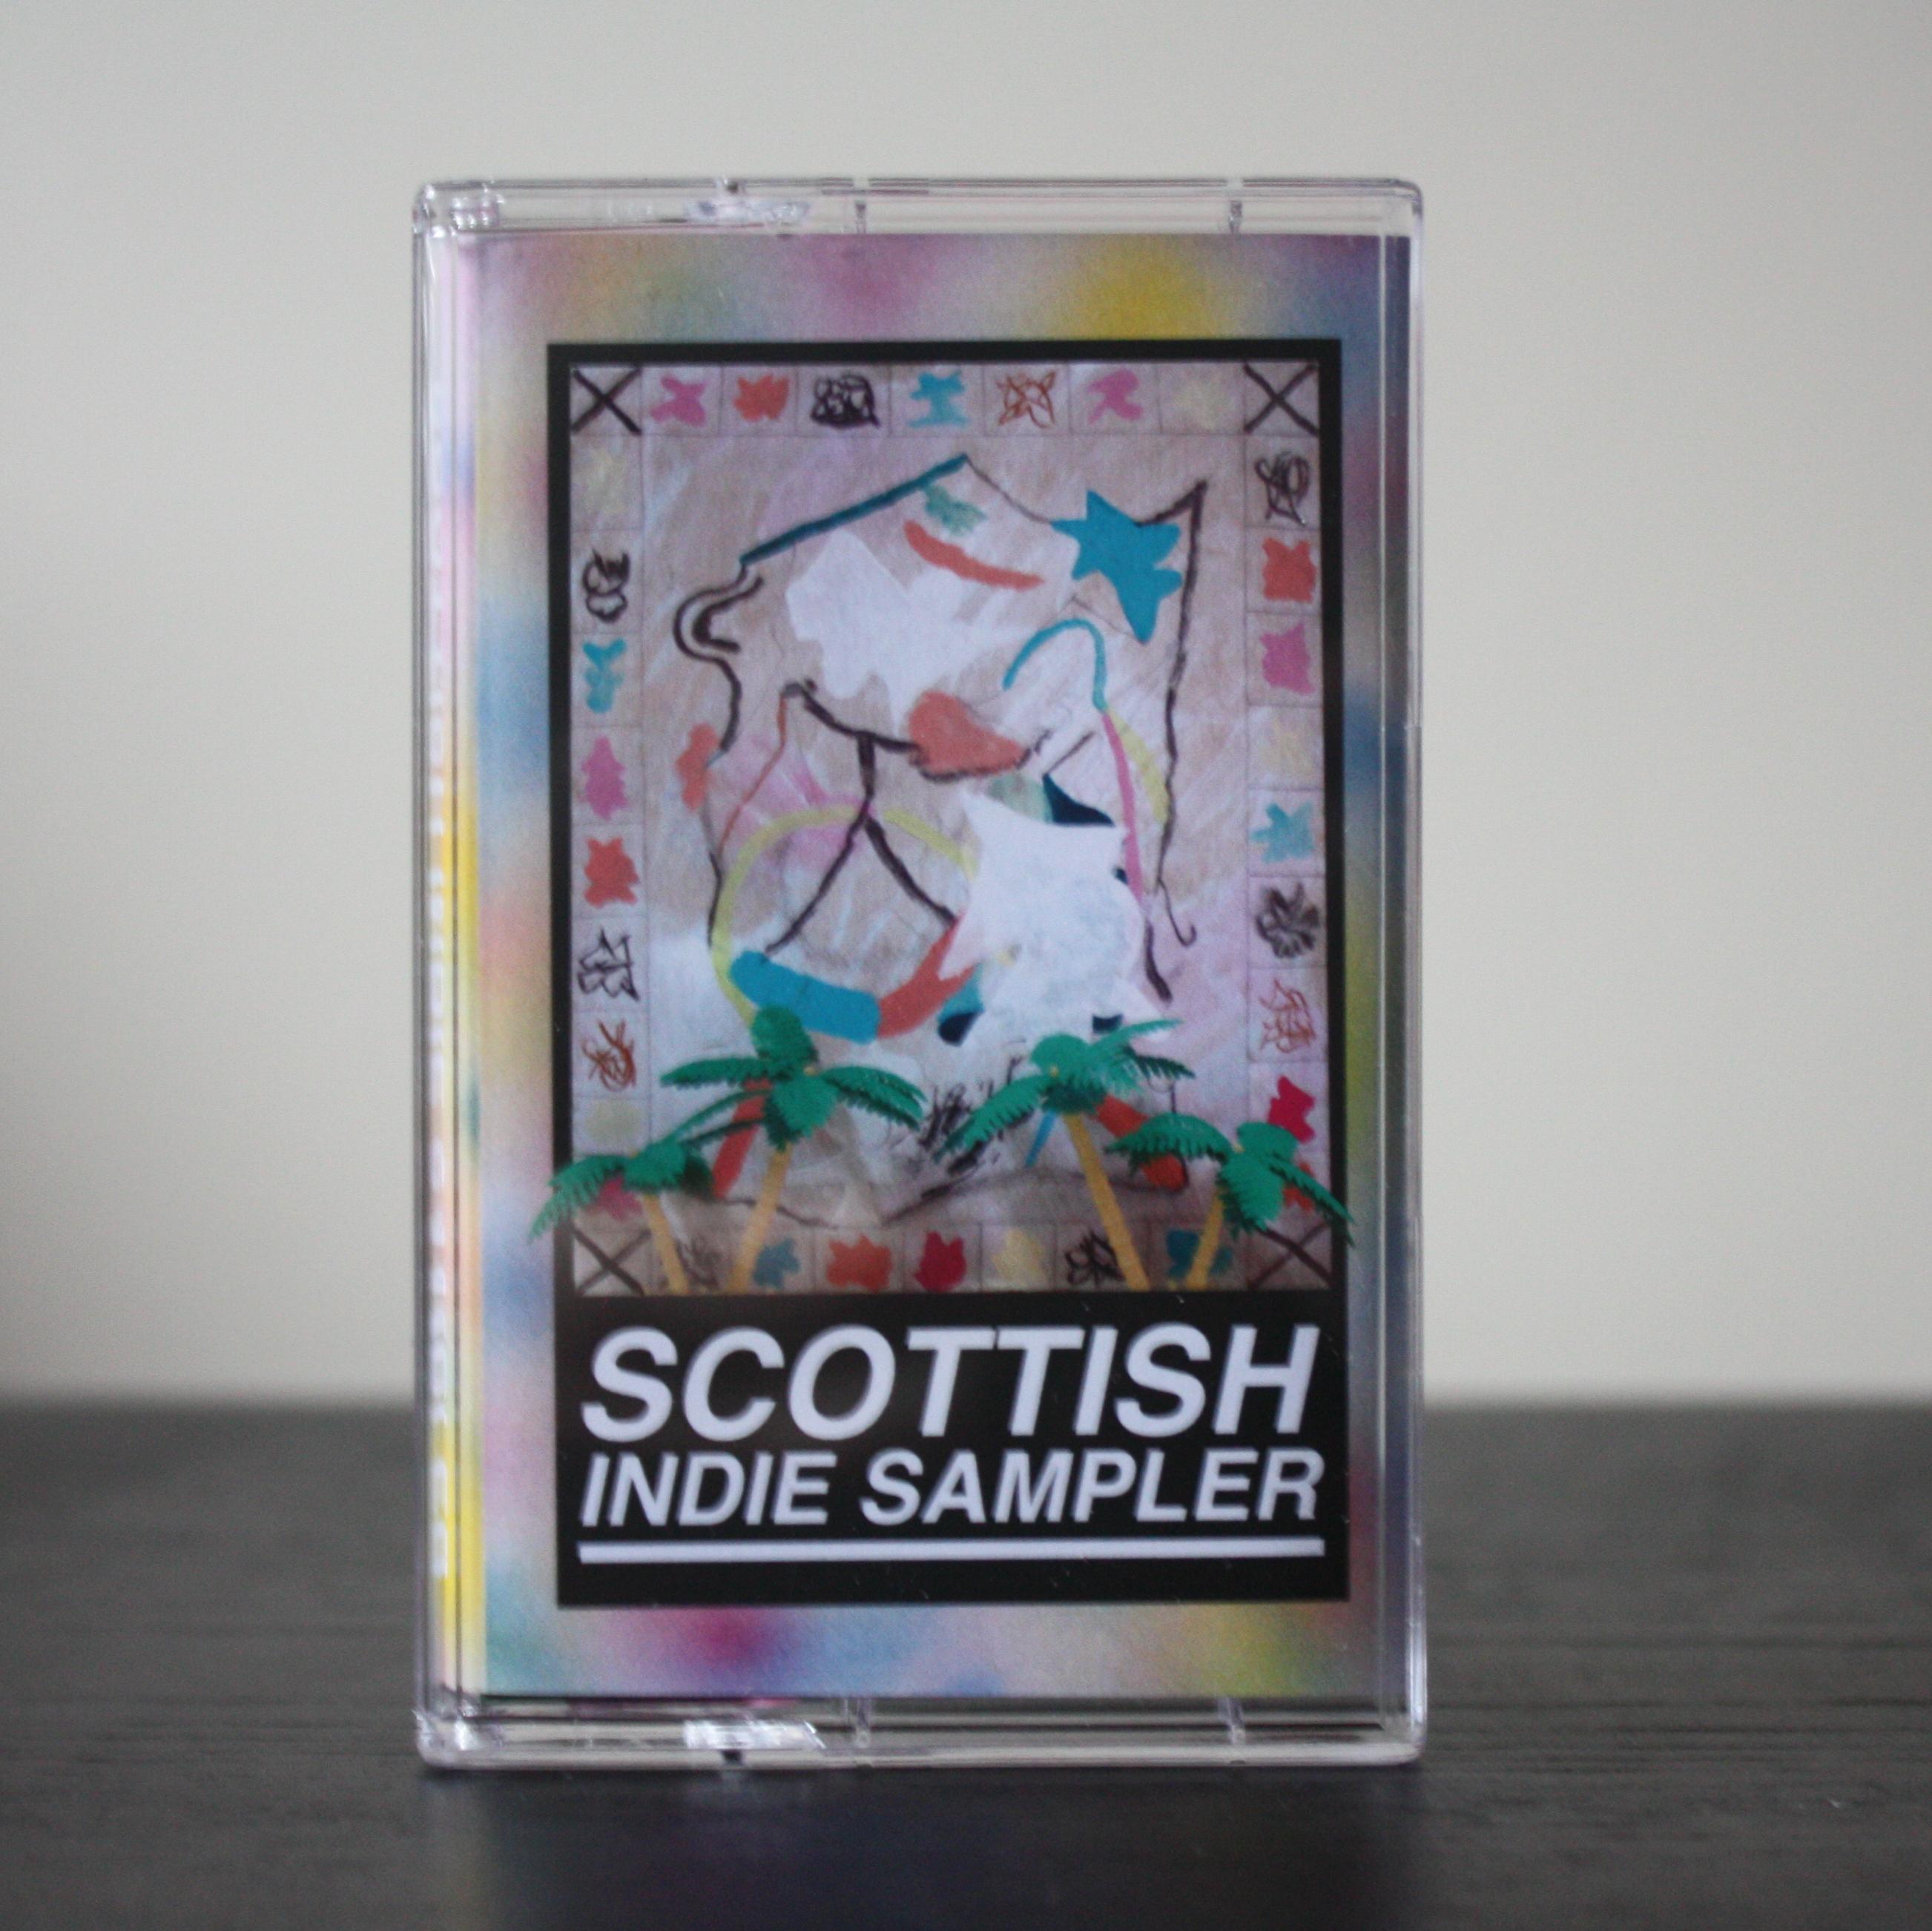 Scottish Indie Sampler